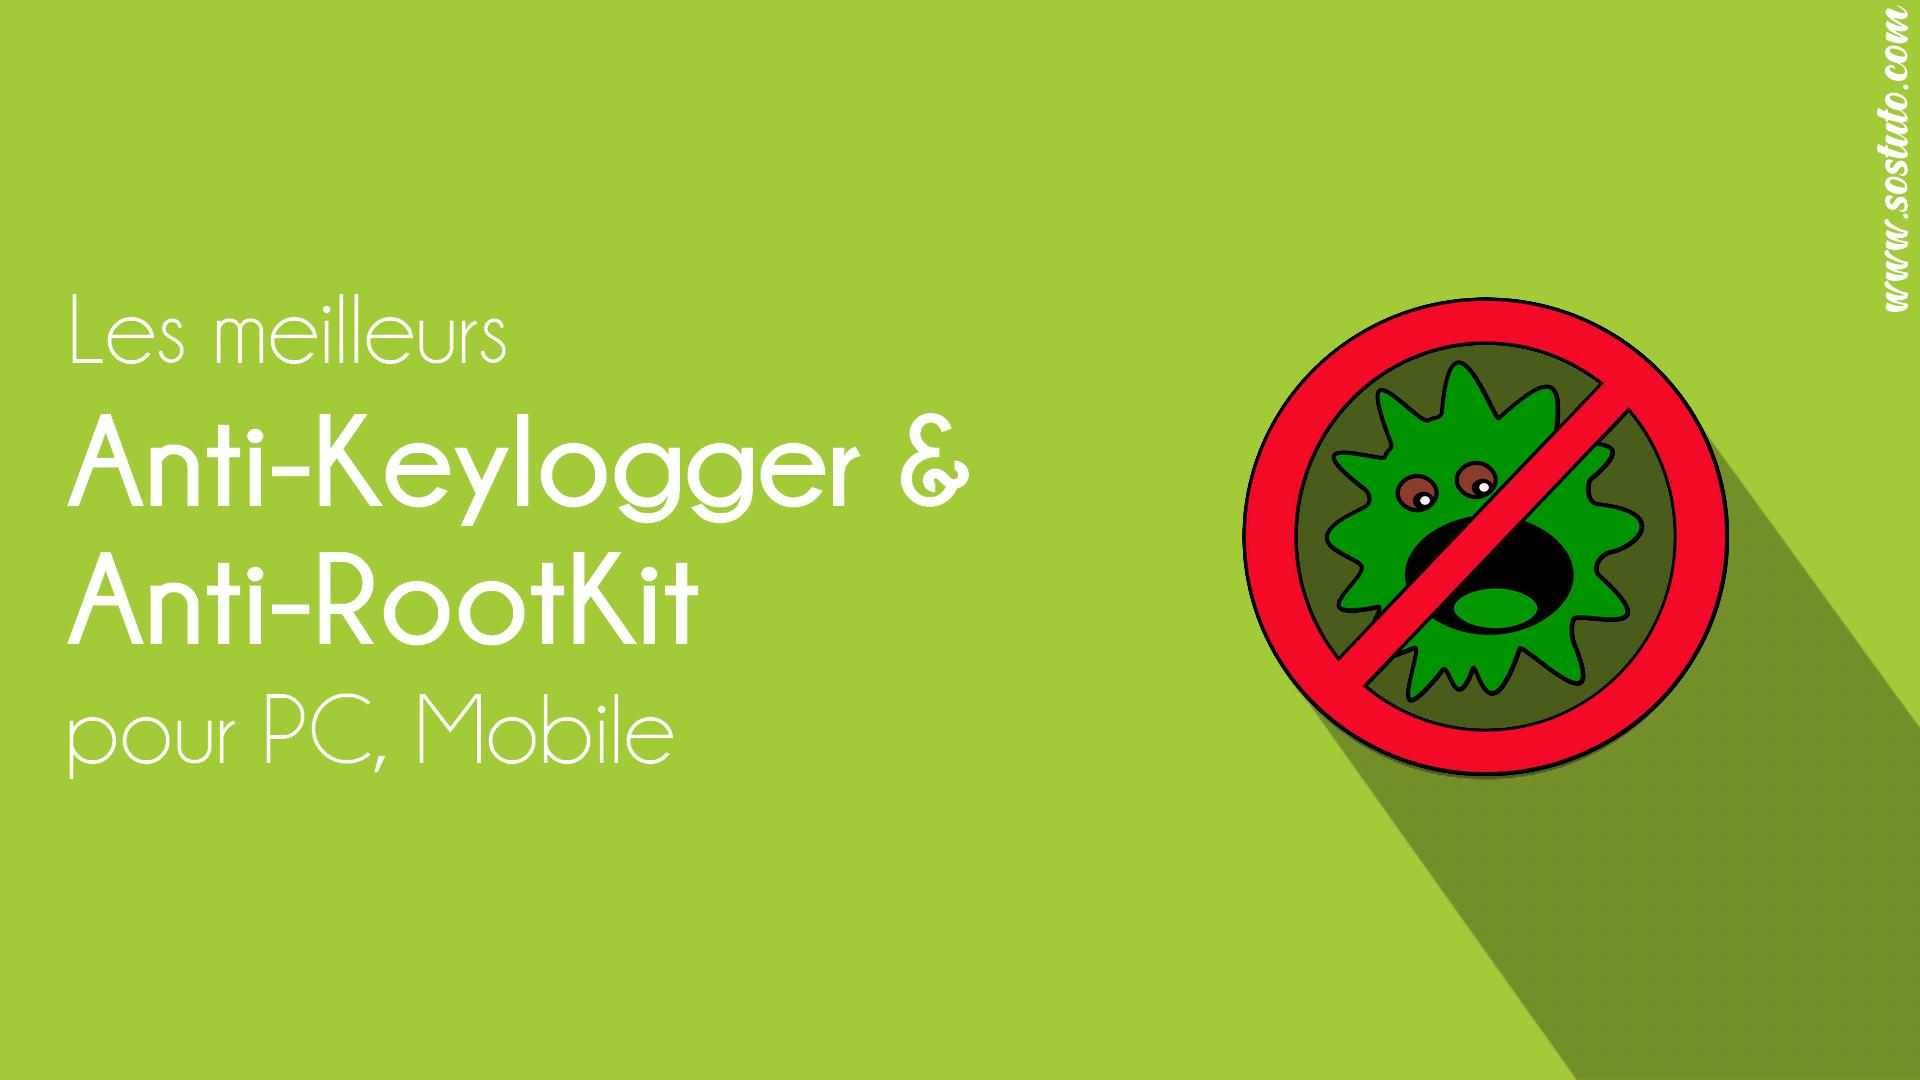 Anti Keylogger windows android Les 10 Meilleurs Anti-Keylogger pour PC Windows, Android (+ Anti-RootKit)